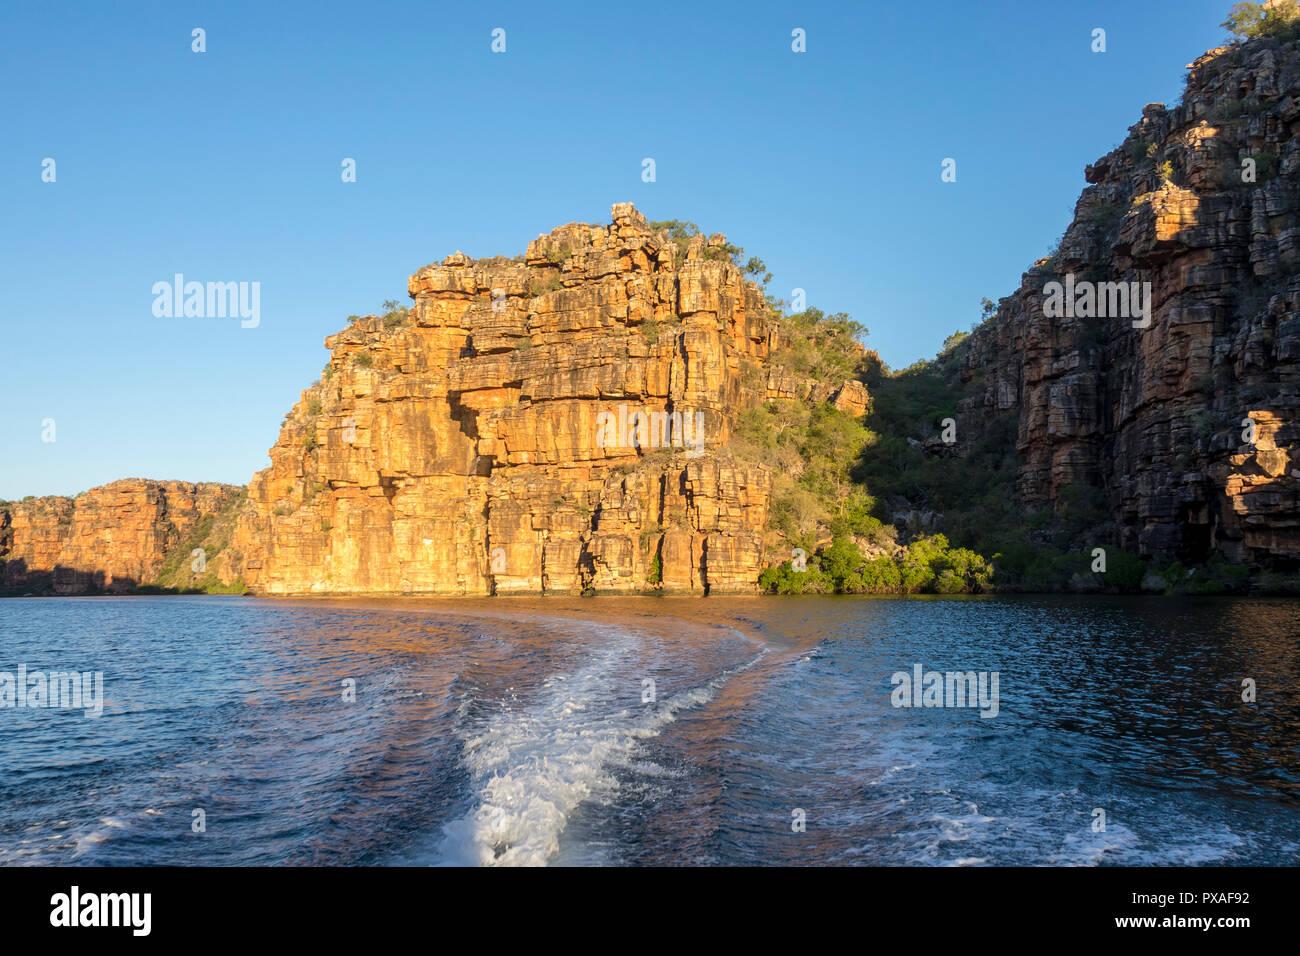 Zodiac cruising on the King George River, Western Australia - Stock Image